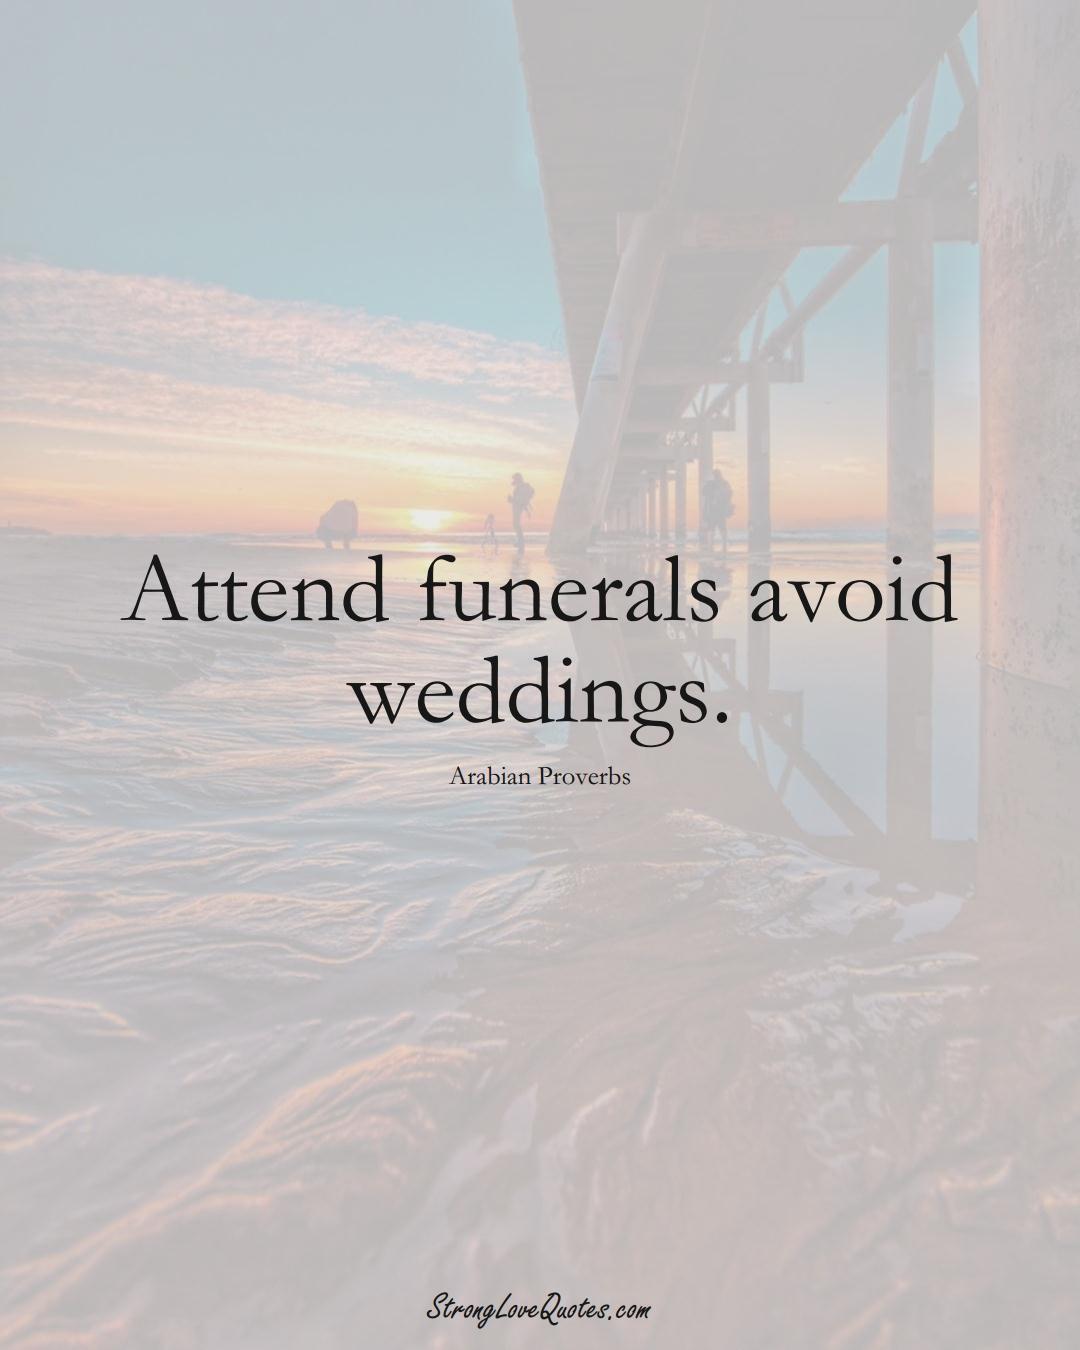 Attend funerals avoid weddings. (Arabian Sayings);  #aVarietyofCulturesSayings